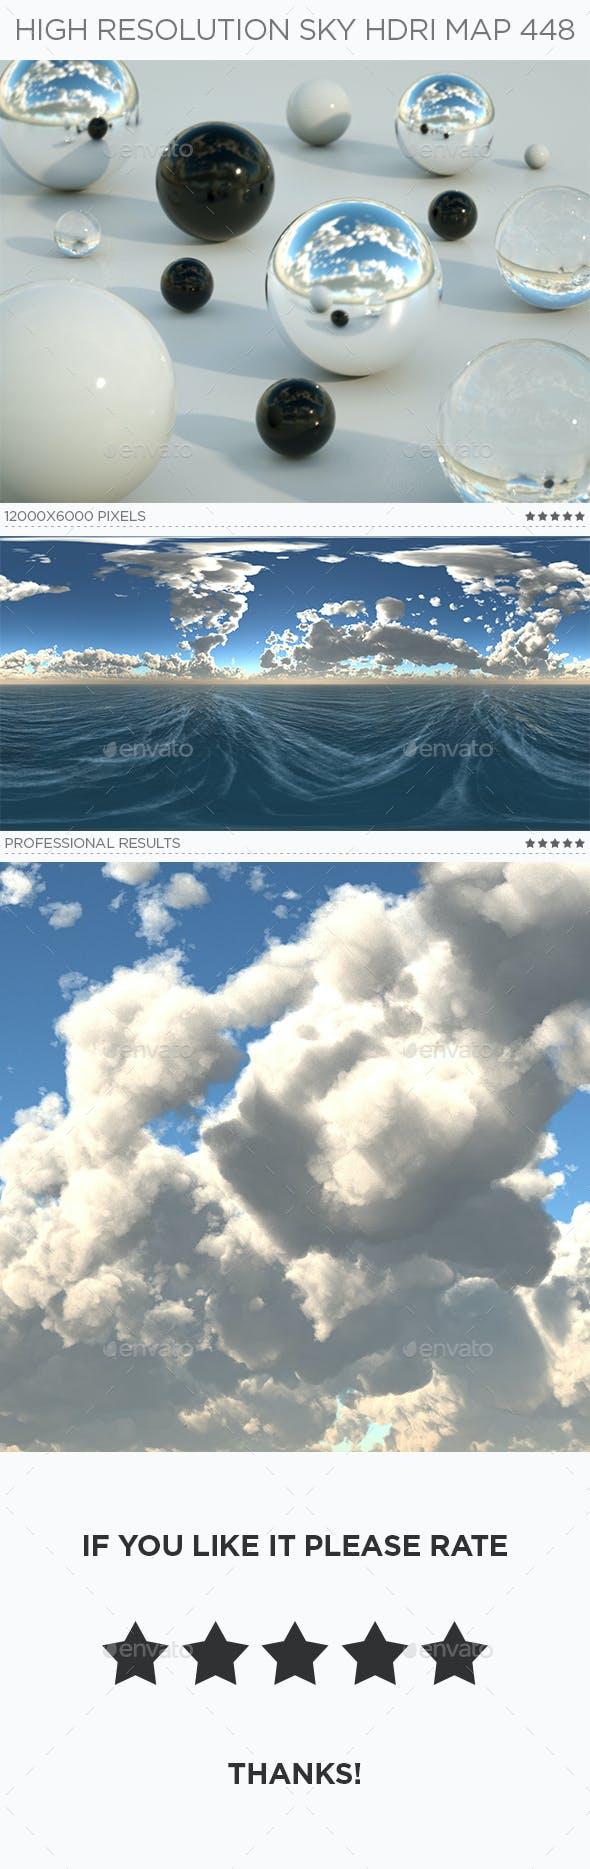 High Resolution Sky HDRi Map 448 - 3DOcean Item for Sale